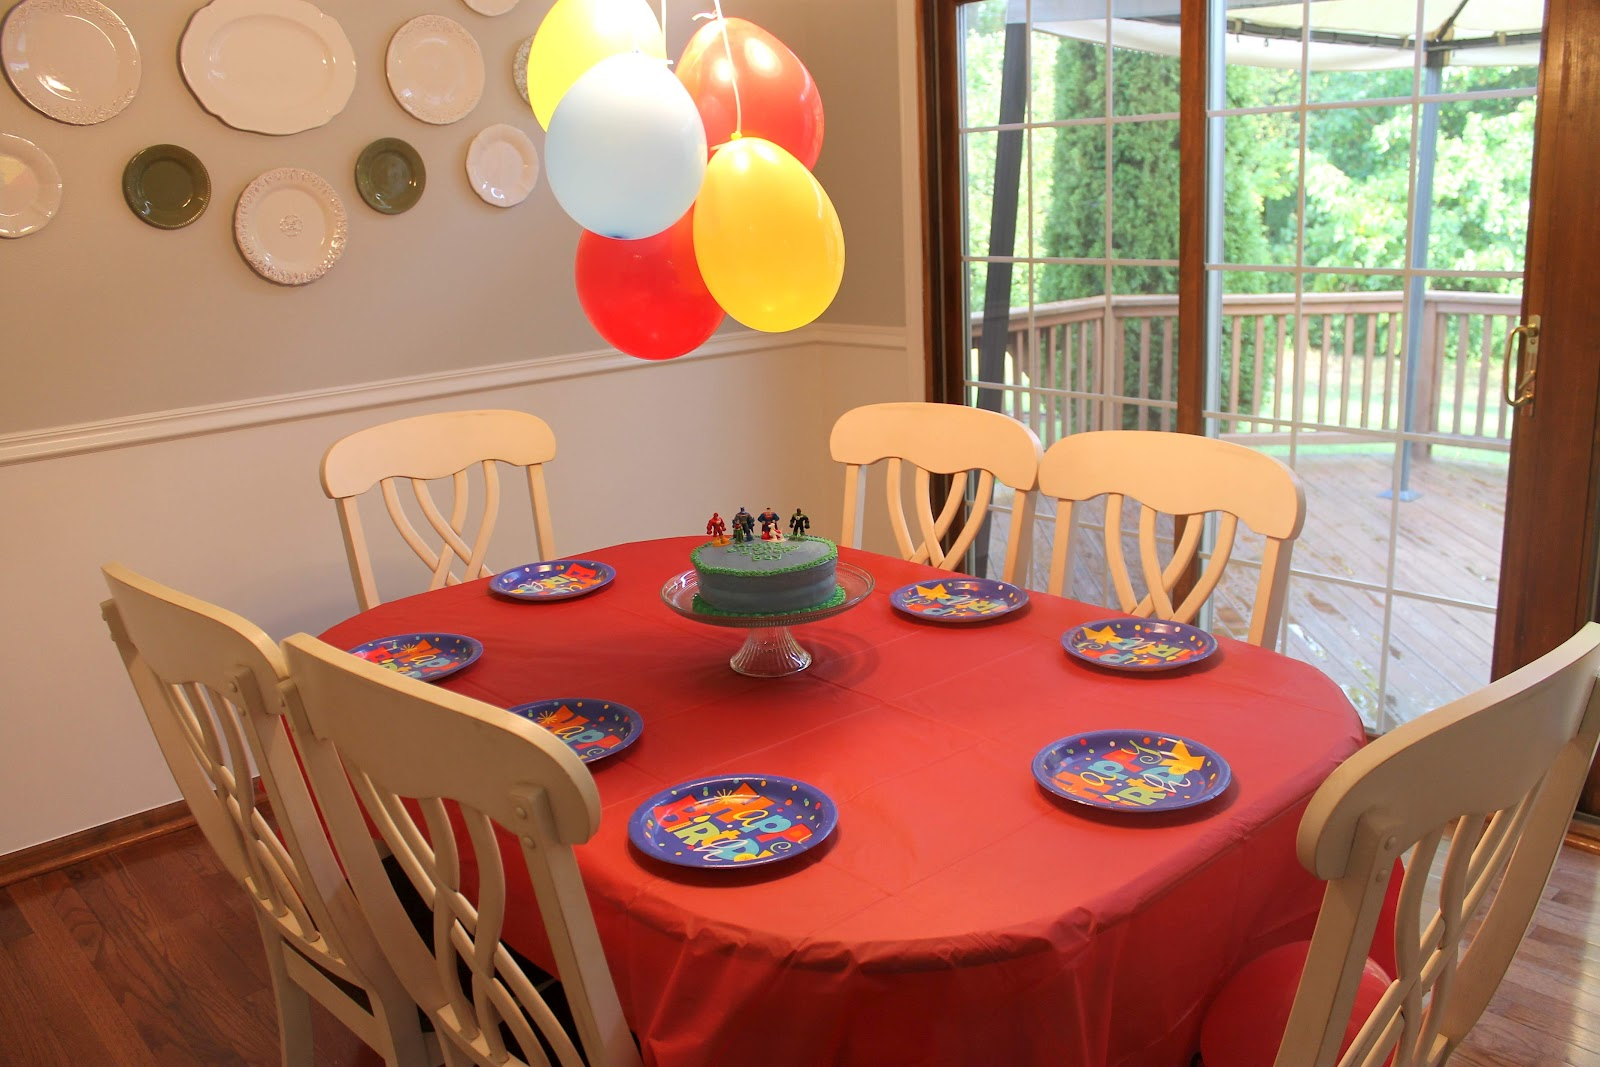 Cake Decorating Templates